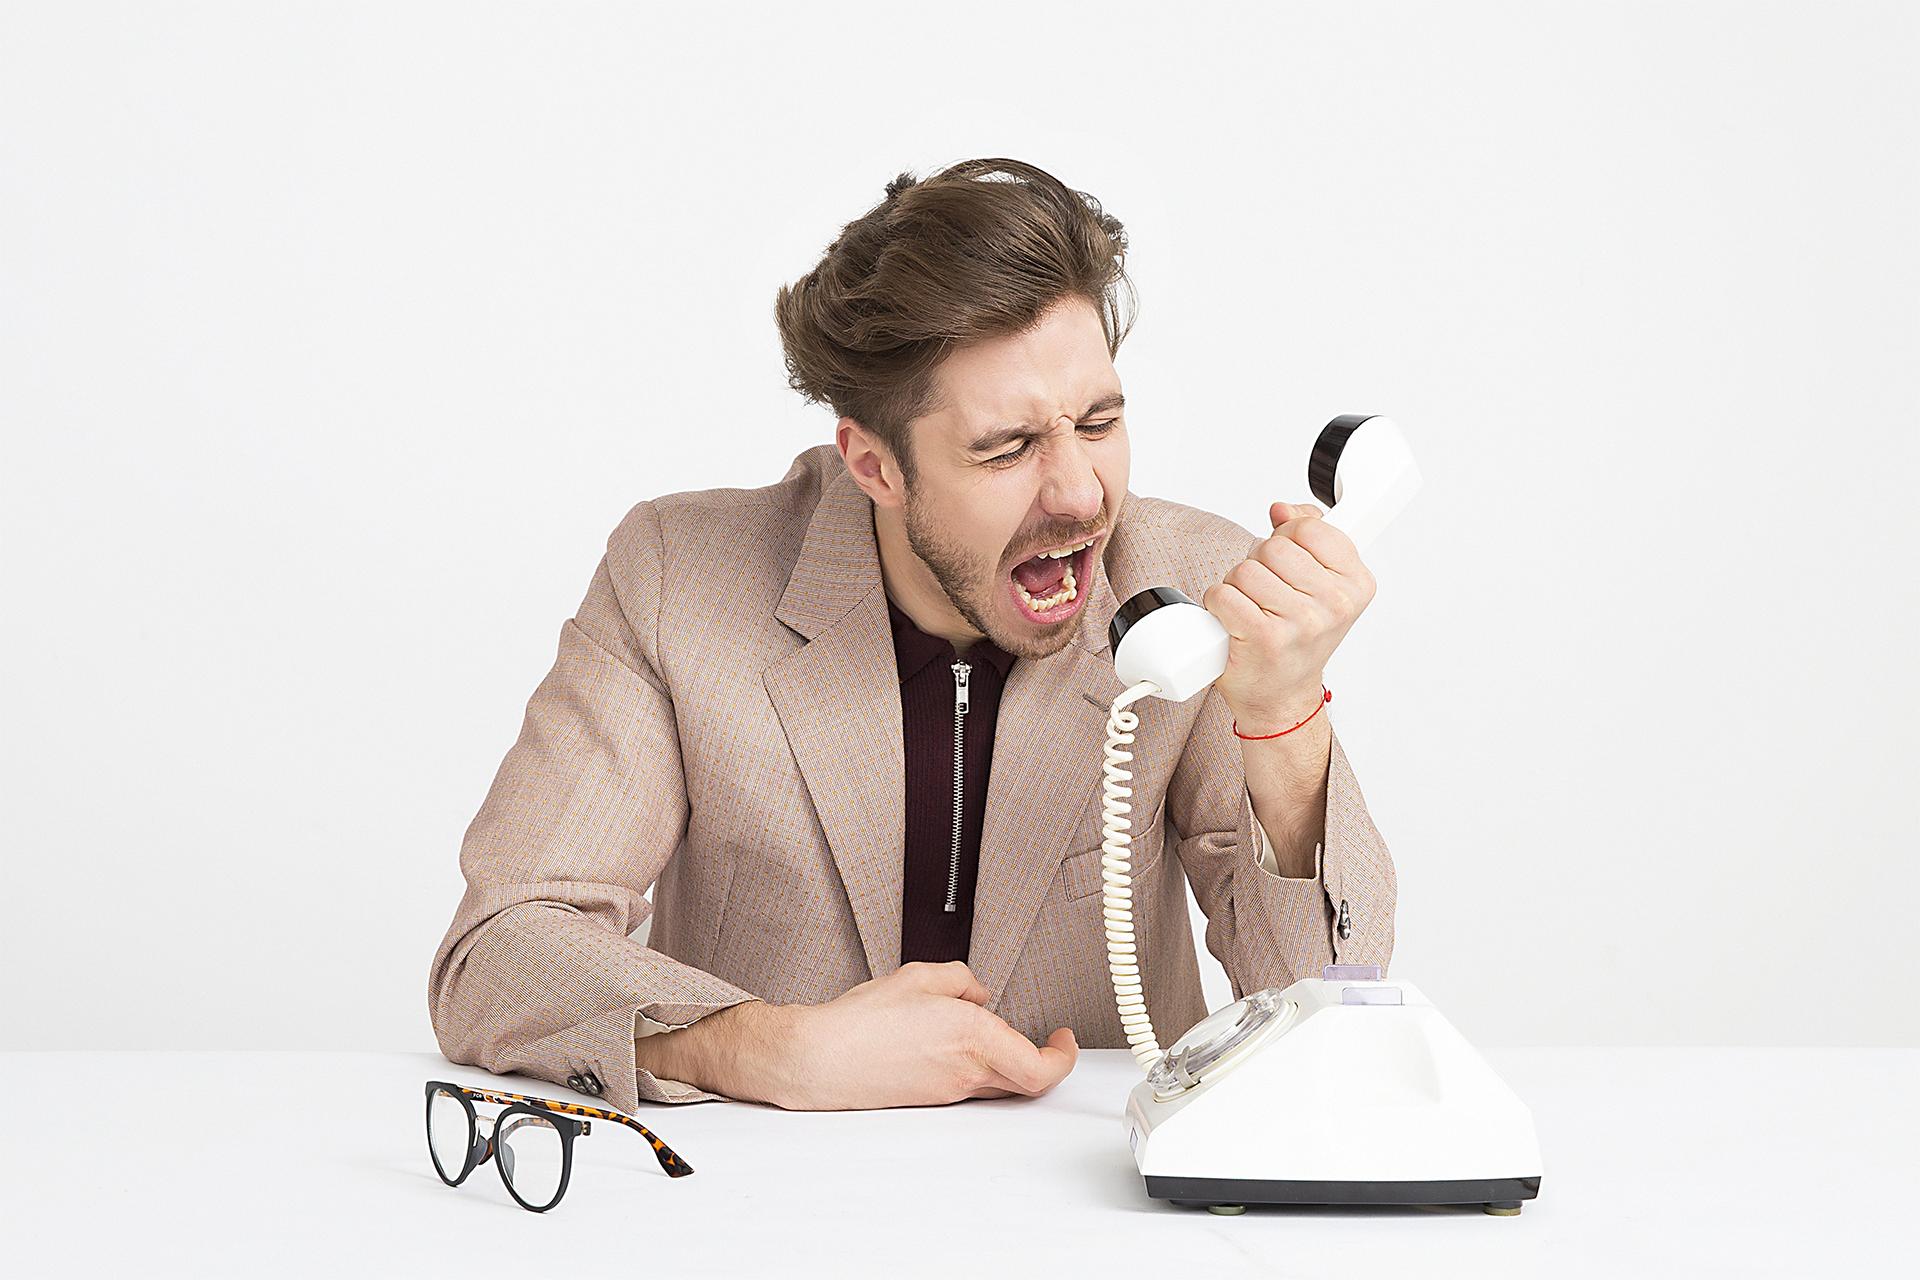 man yelling into phone